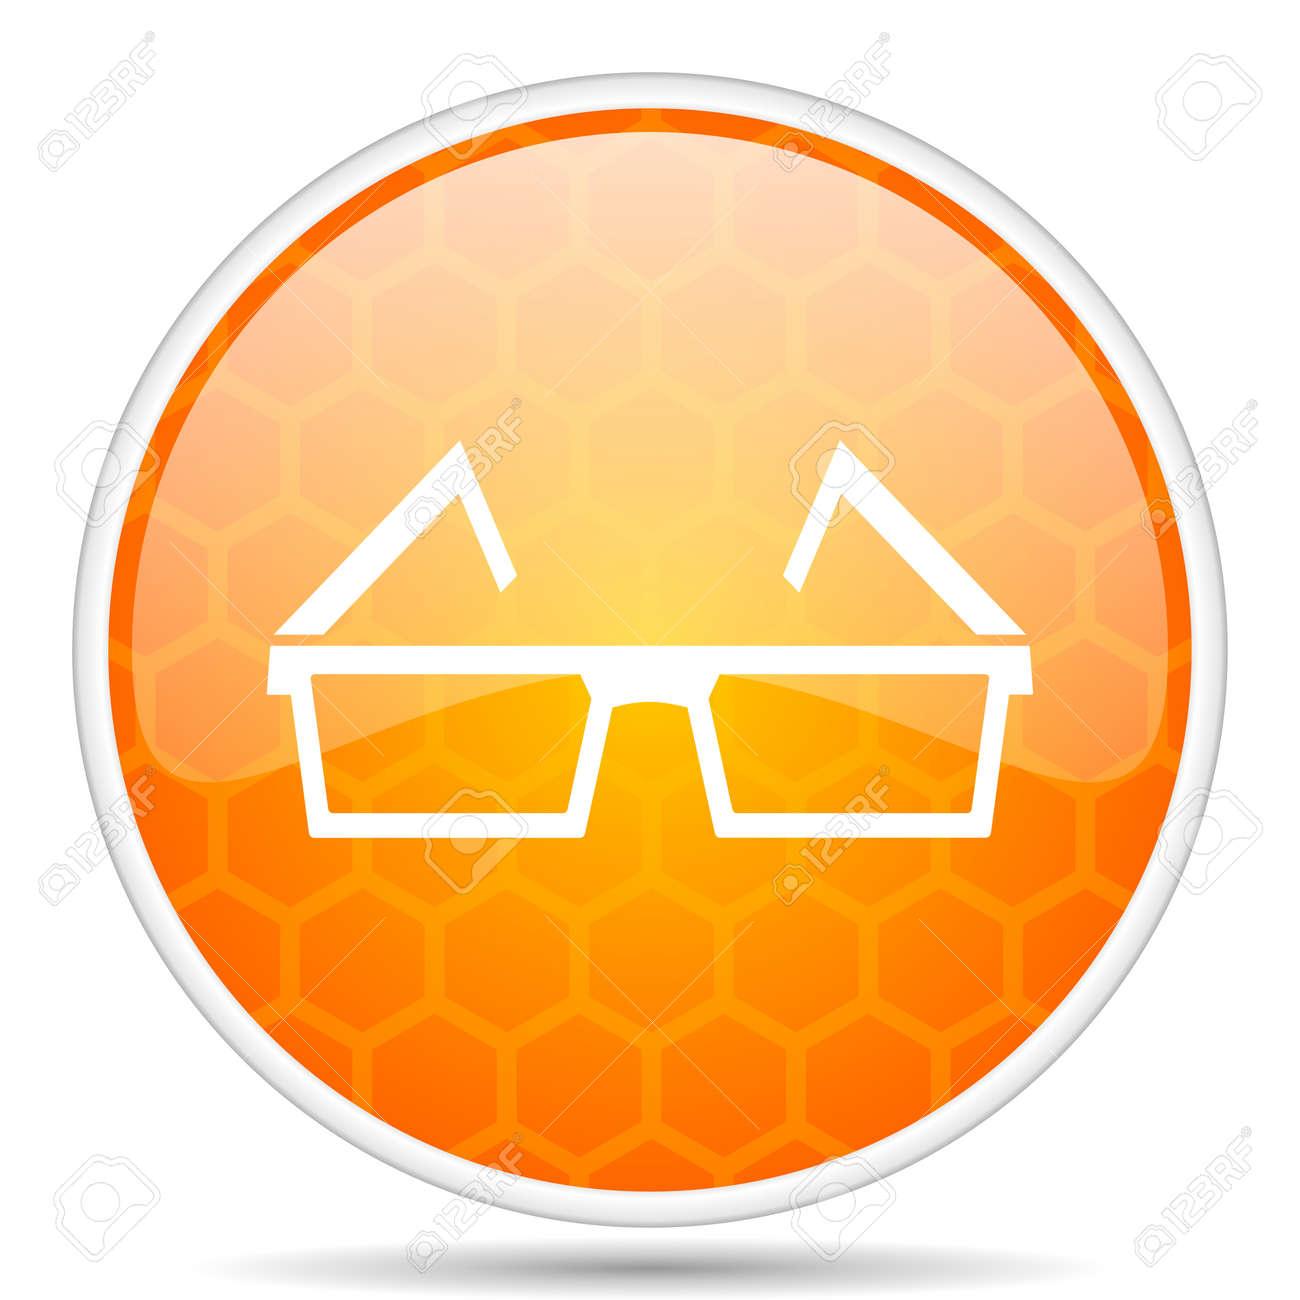 cf652eca094 3d glasses web icon. Round orange glossy internet button for webdesign.  Stock Photo -